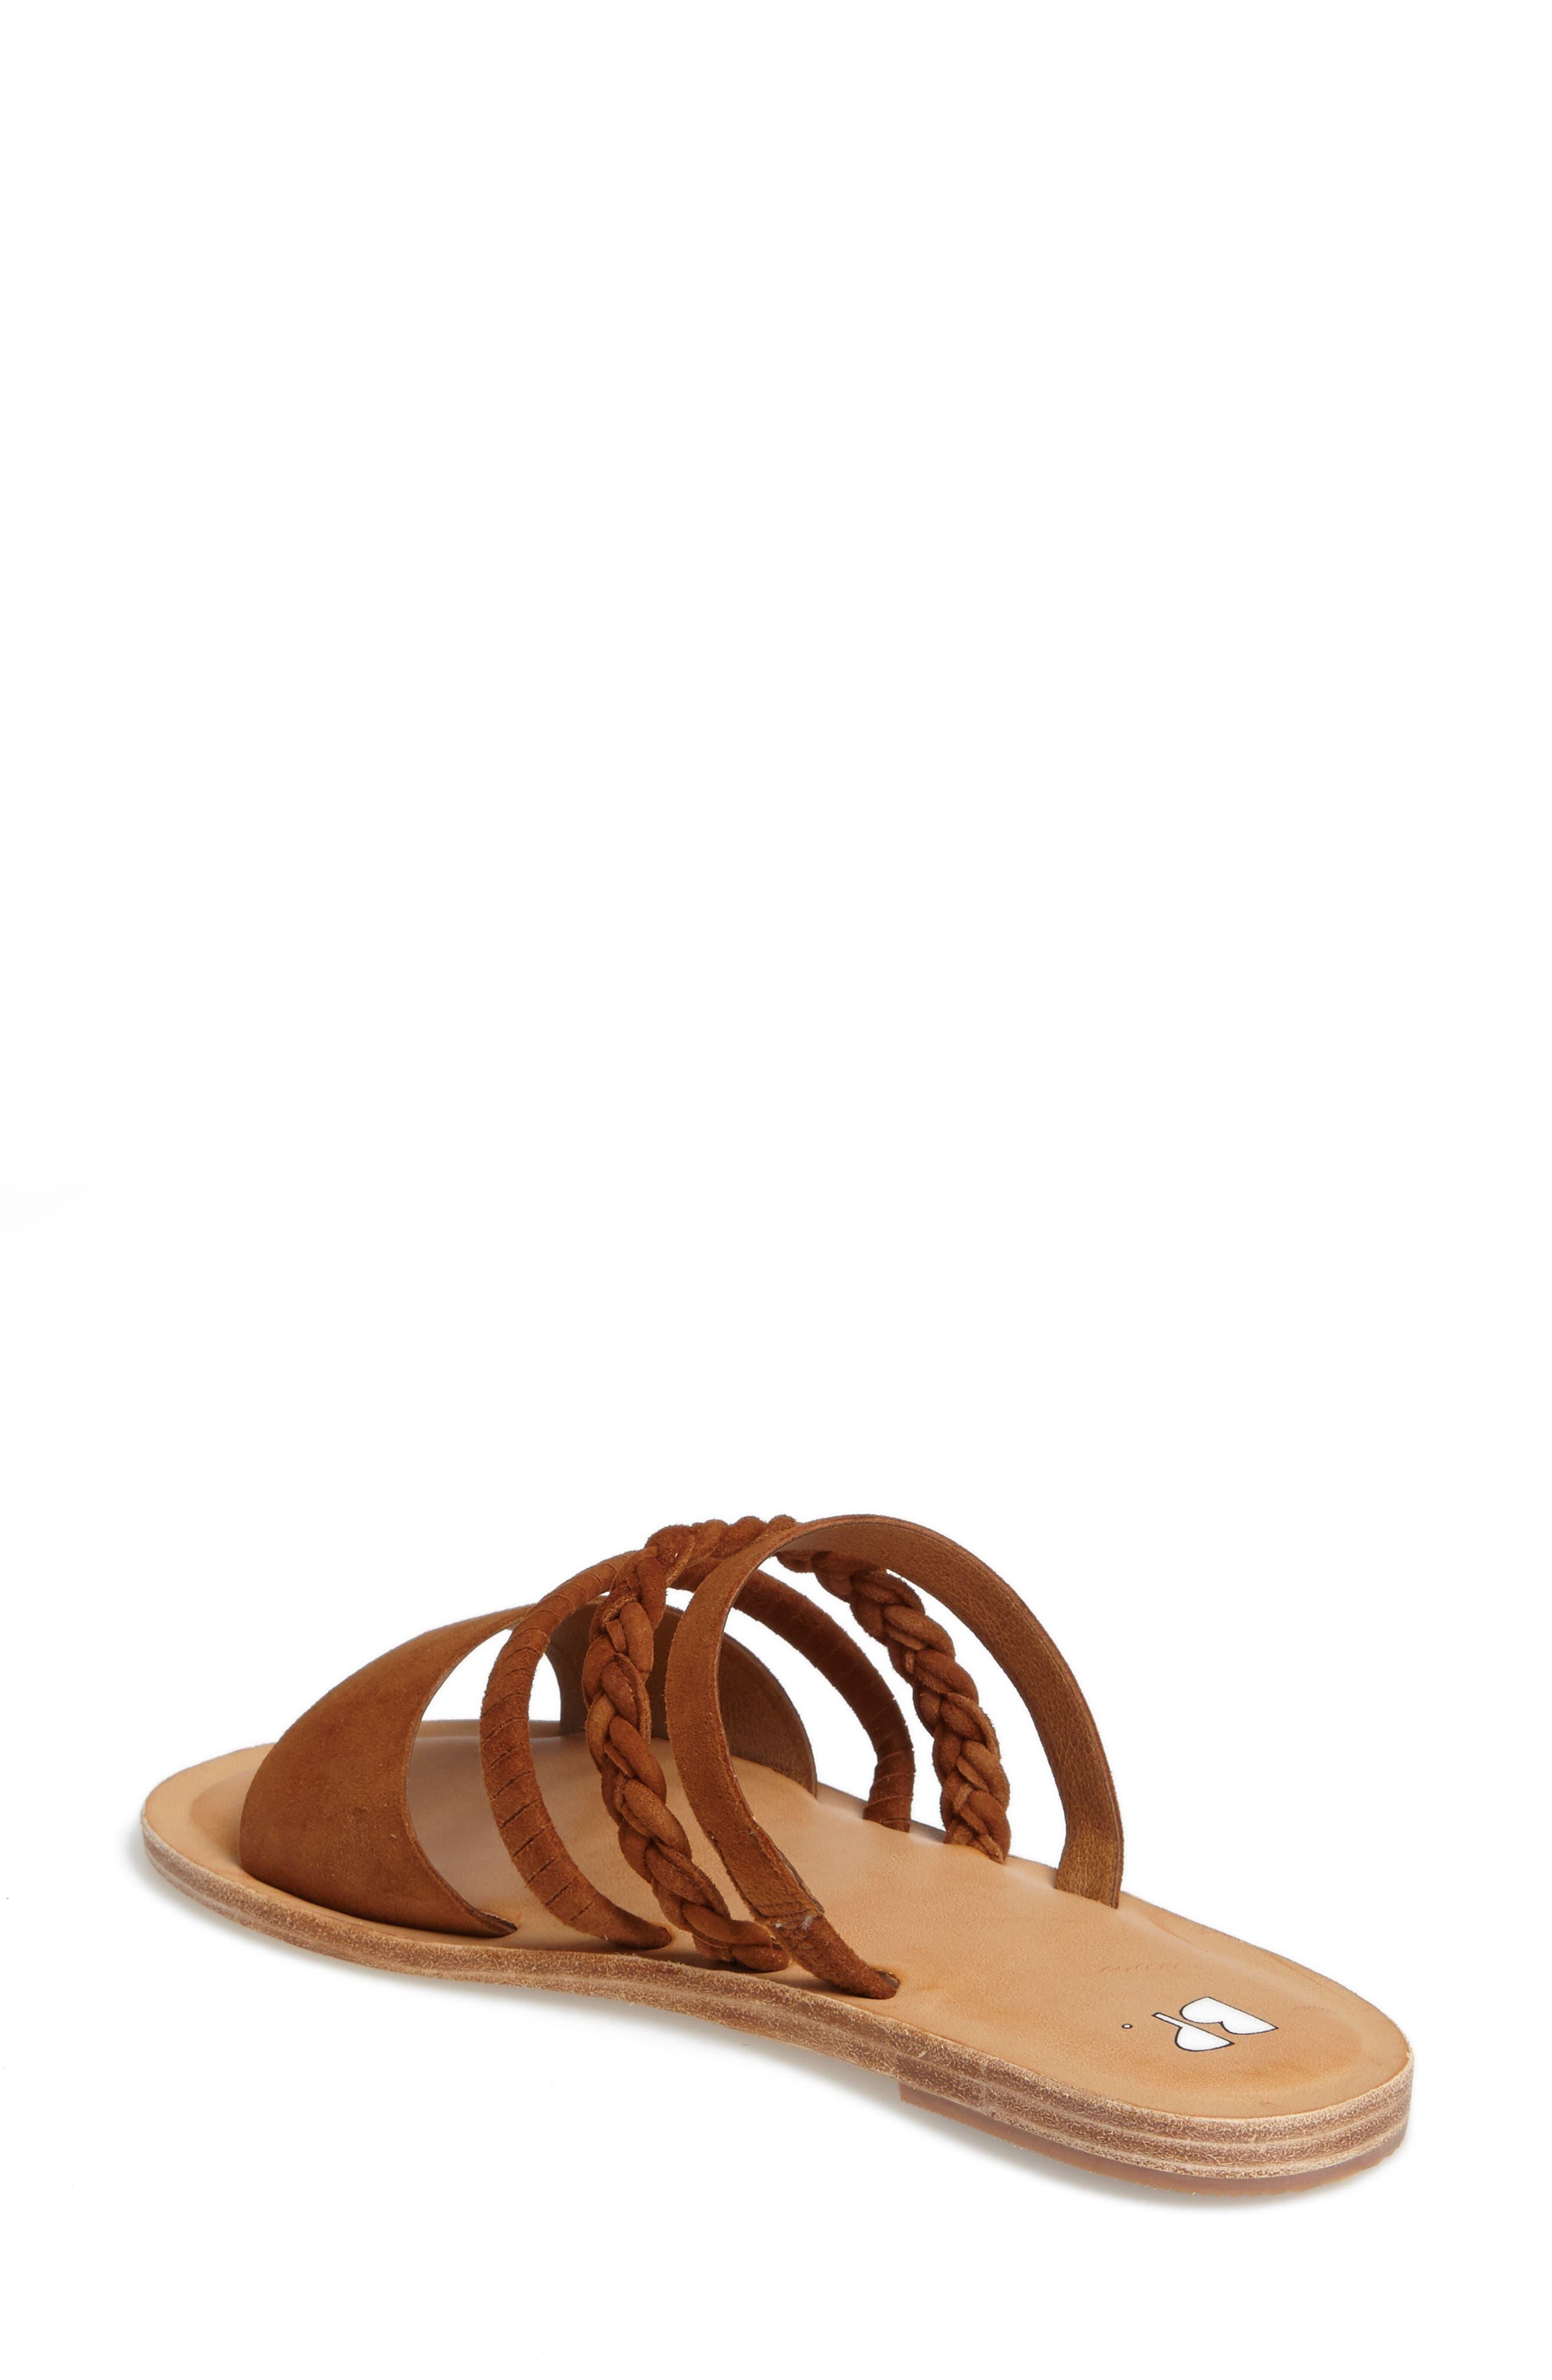 BP., Bayla Strappy Slip-On Sandal, Alternate thumbnail 2, color, 202